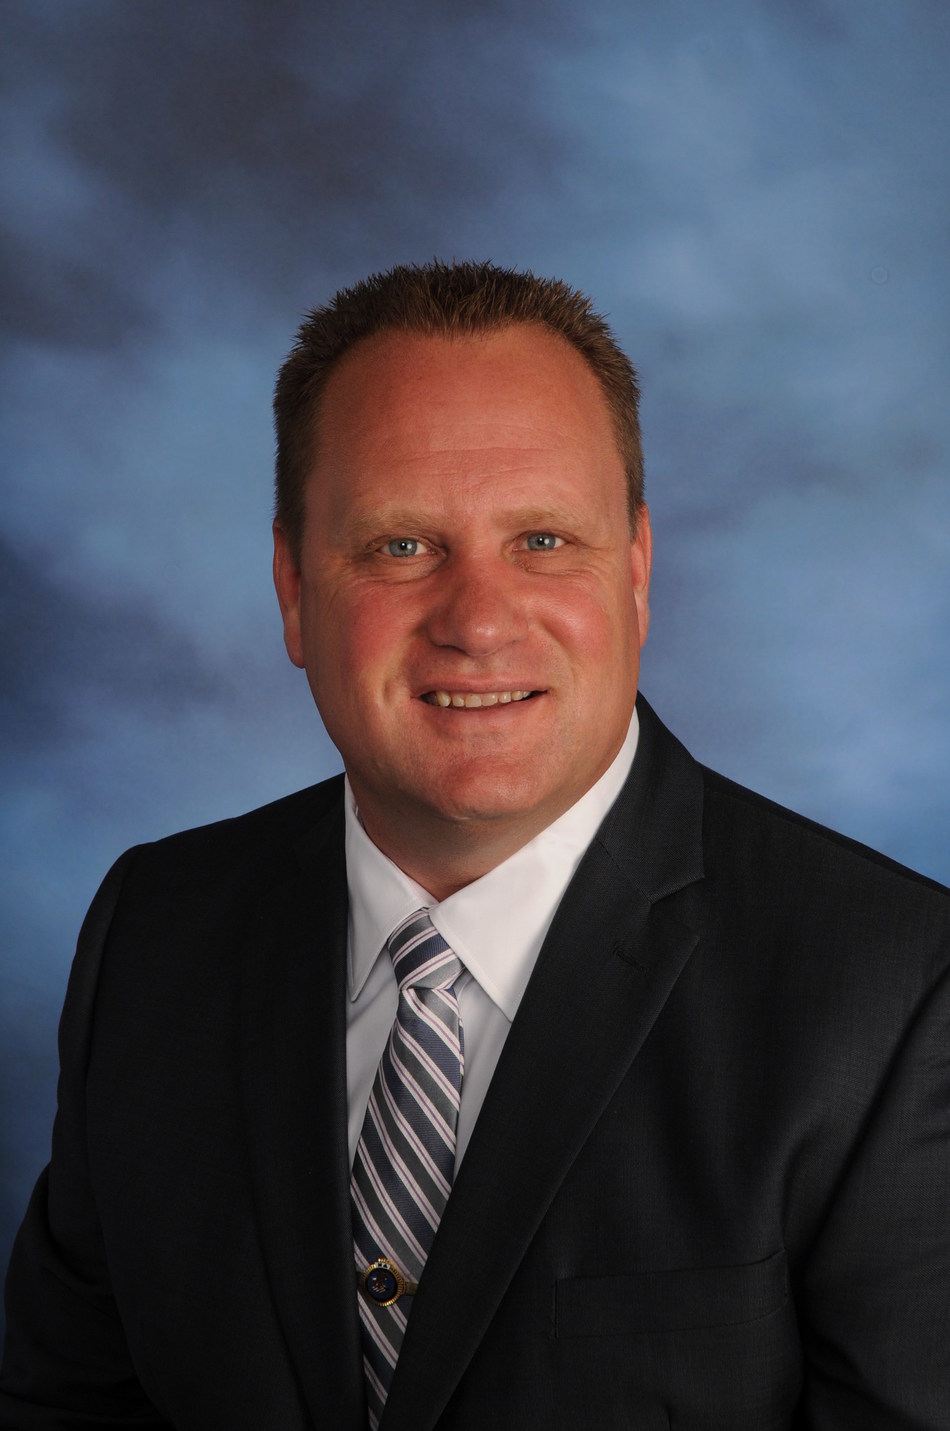 Chad Newton, A.A.E. -- CEO, Wayne County Airport Authority